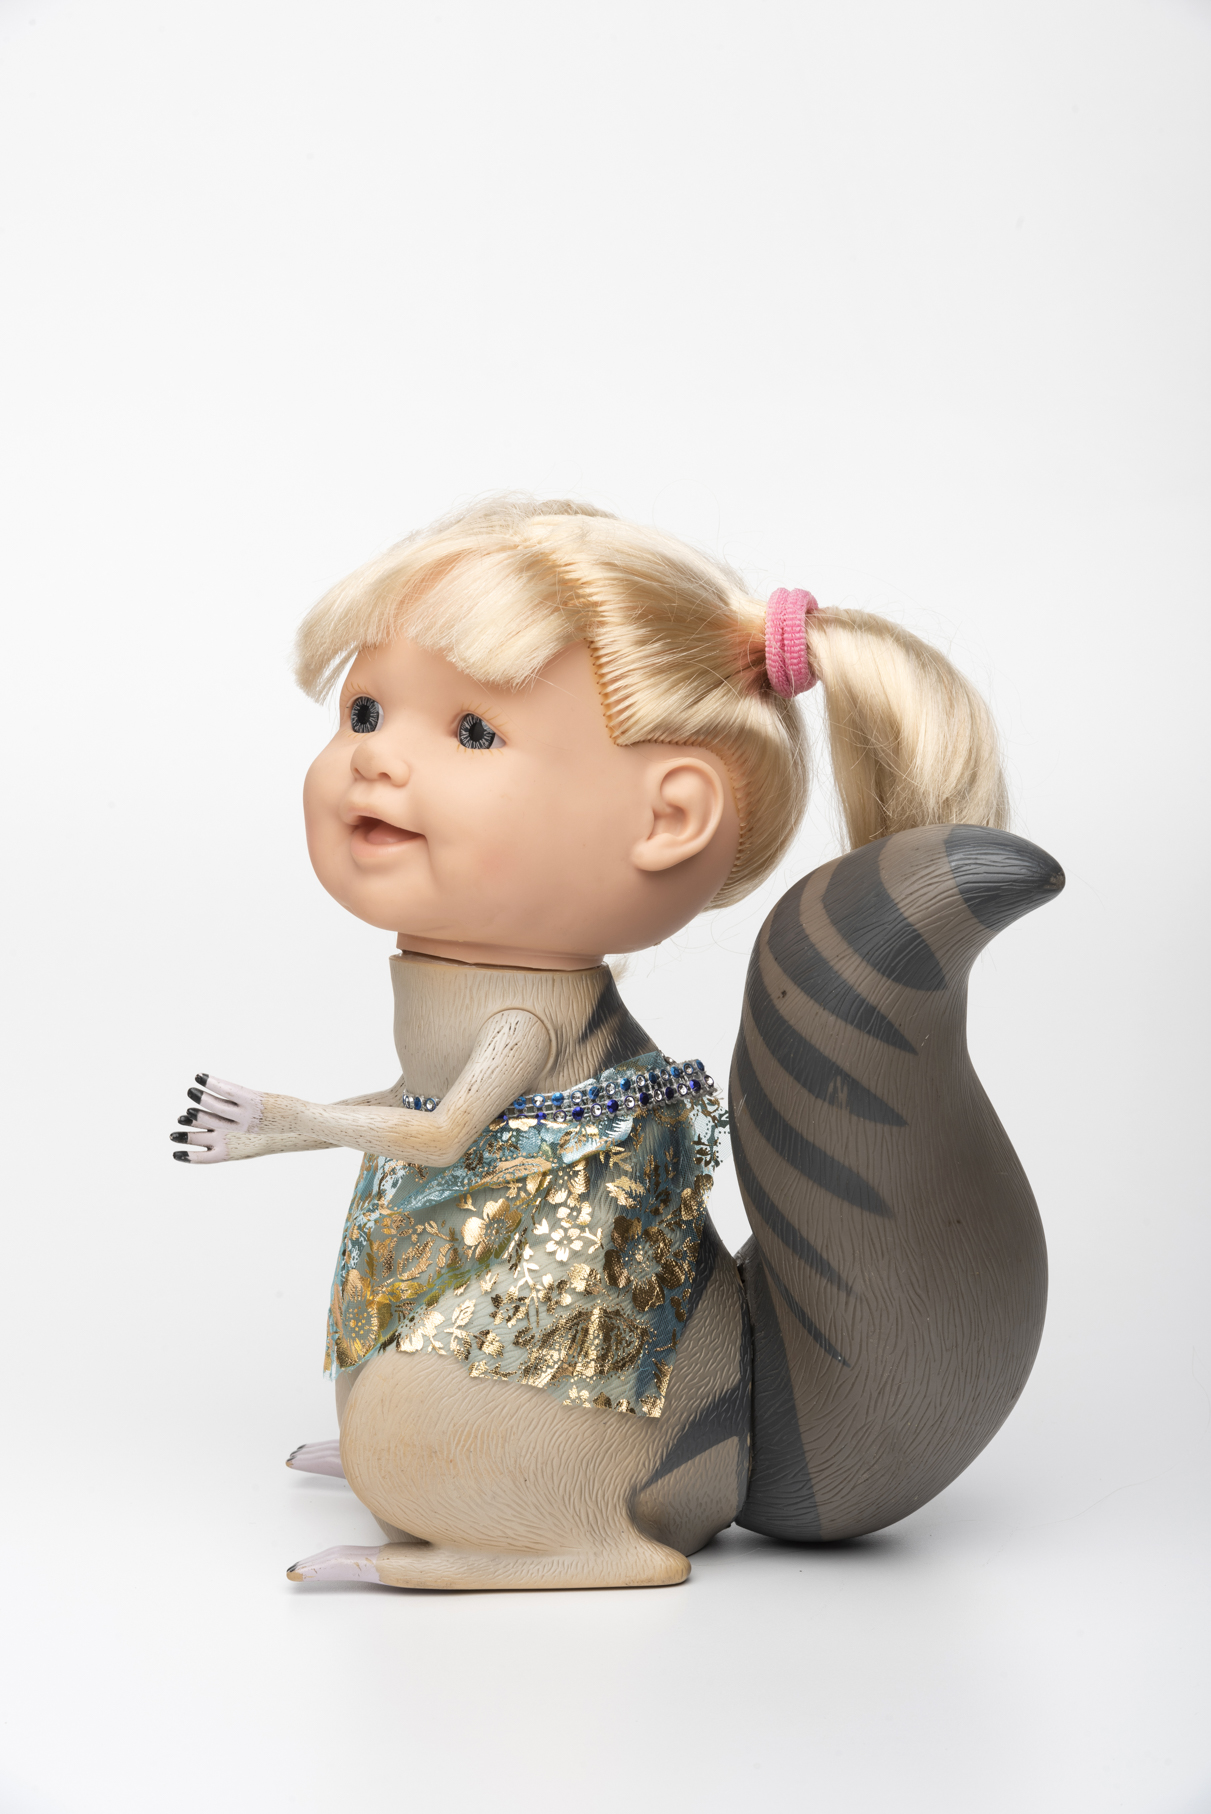 Alvimar Maia, sem Título, partes de bonecos, animais de borracha, 29 x 16 x 24 cm, 2017